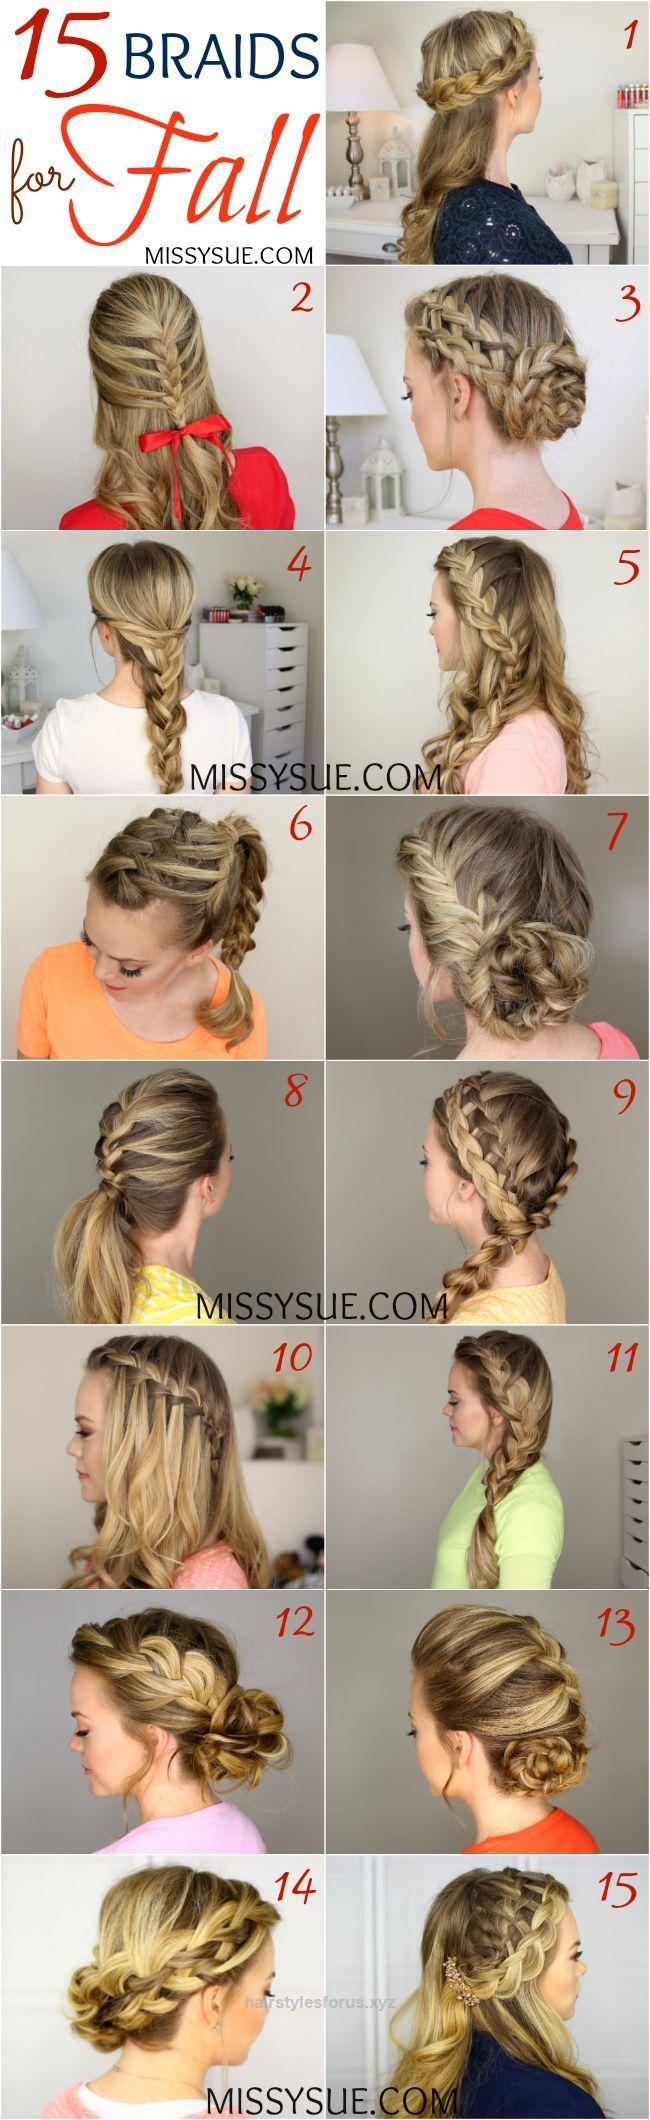 Splendid See more hairstyle tutorials on pinmakeuptips.com……  The post  See more hairstyle tutorials on pinmakeuptips.com………  appeared first on  Hairstyles .